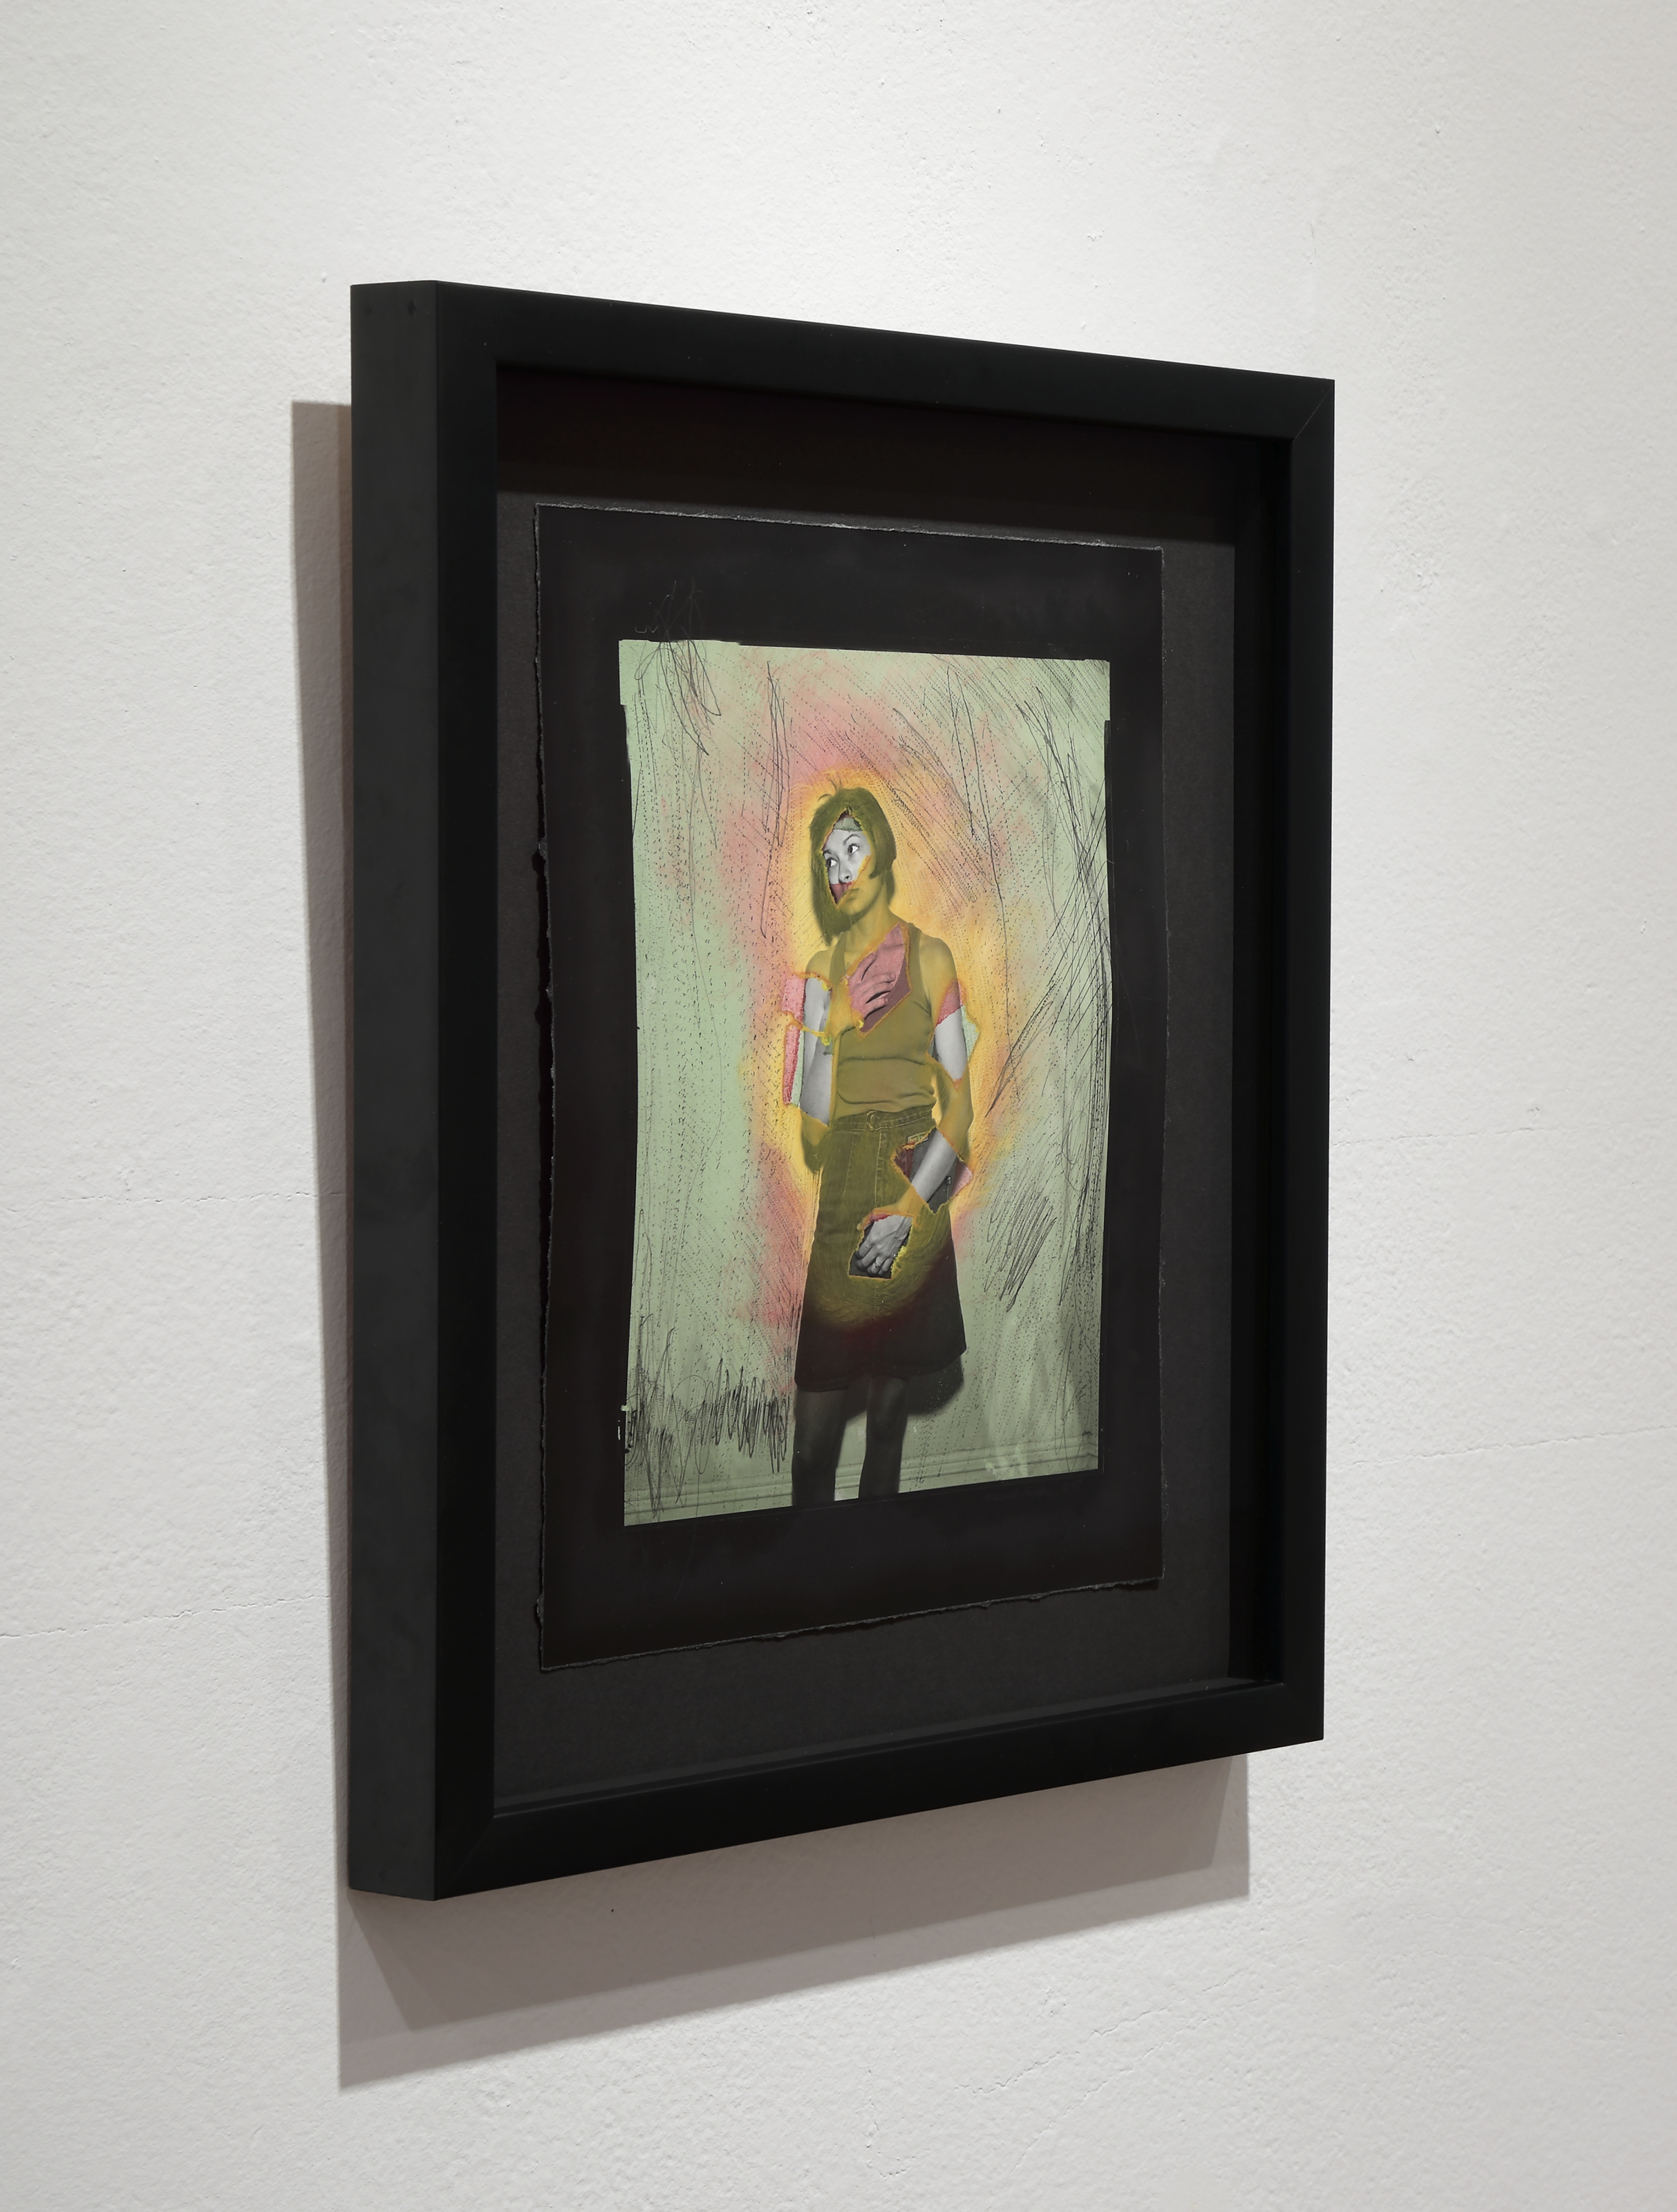 Cindy Neuschwander,   Untitled,  1985  Photograph with mixed media  Courtesy Jay Barrows, photo by David Hunter Hale